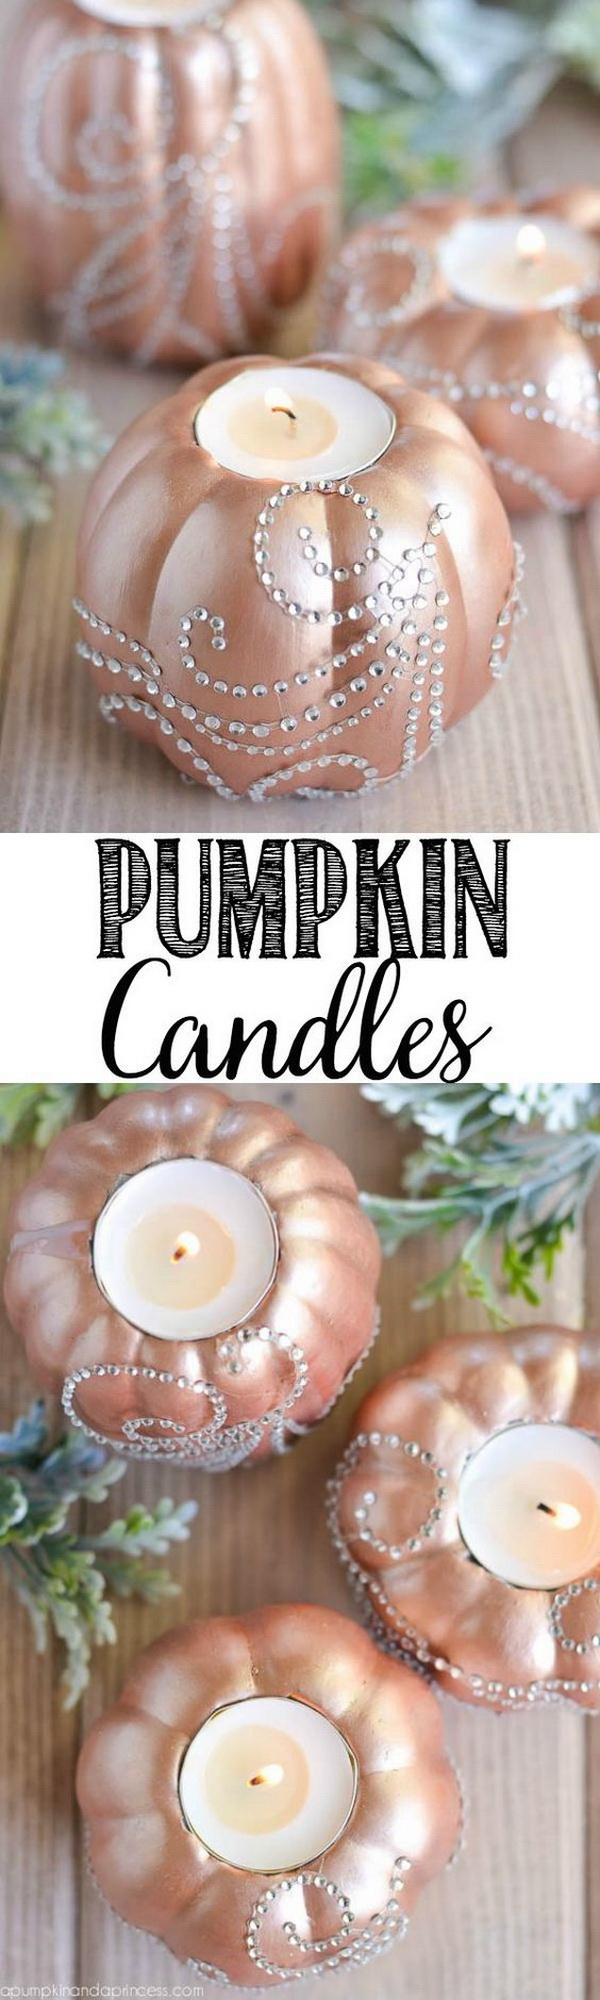 DIY Pumpkin Candles.